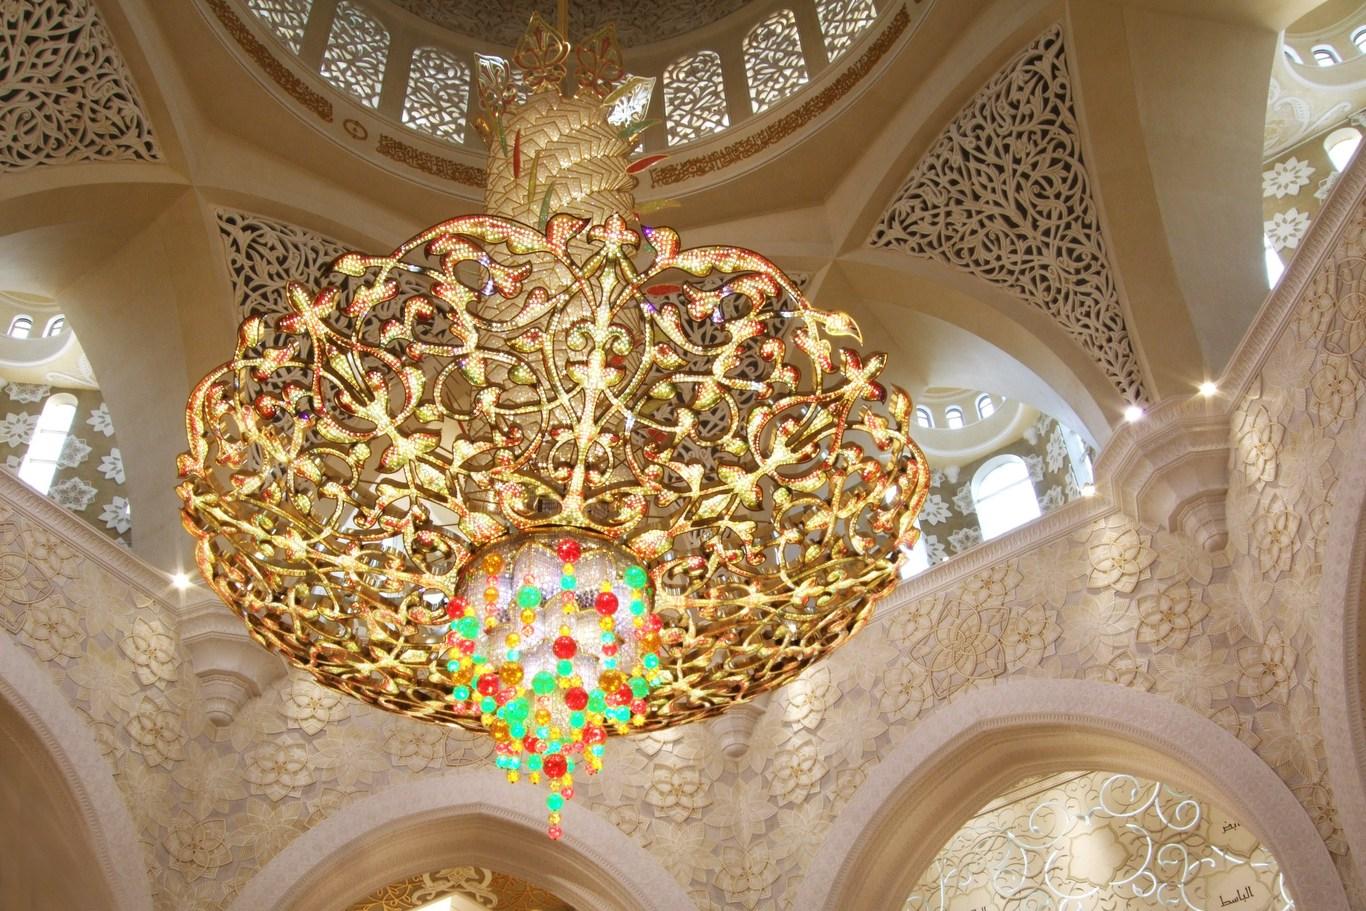 Chandelier in the mosque